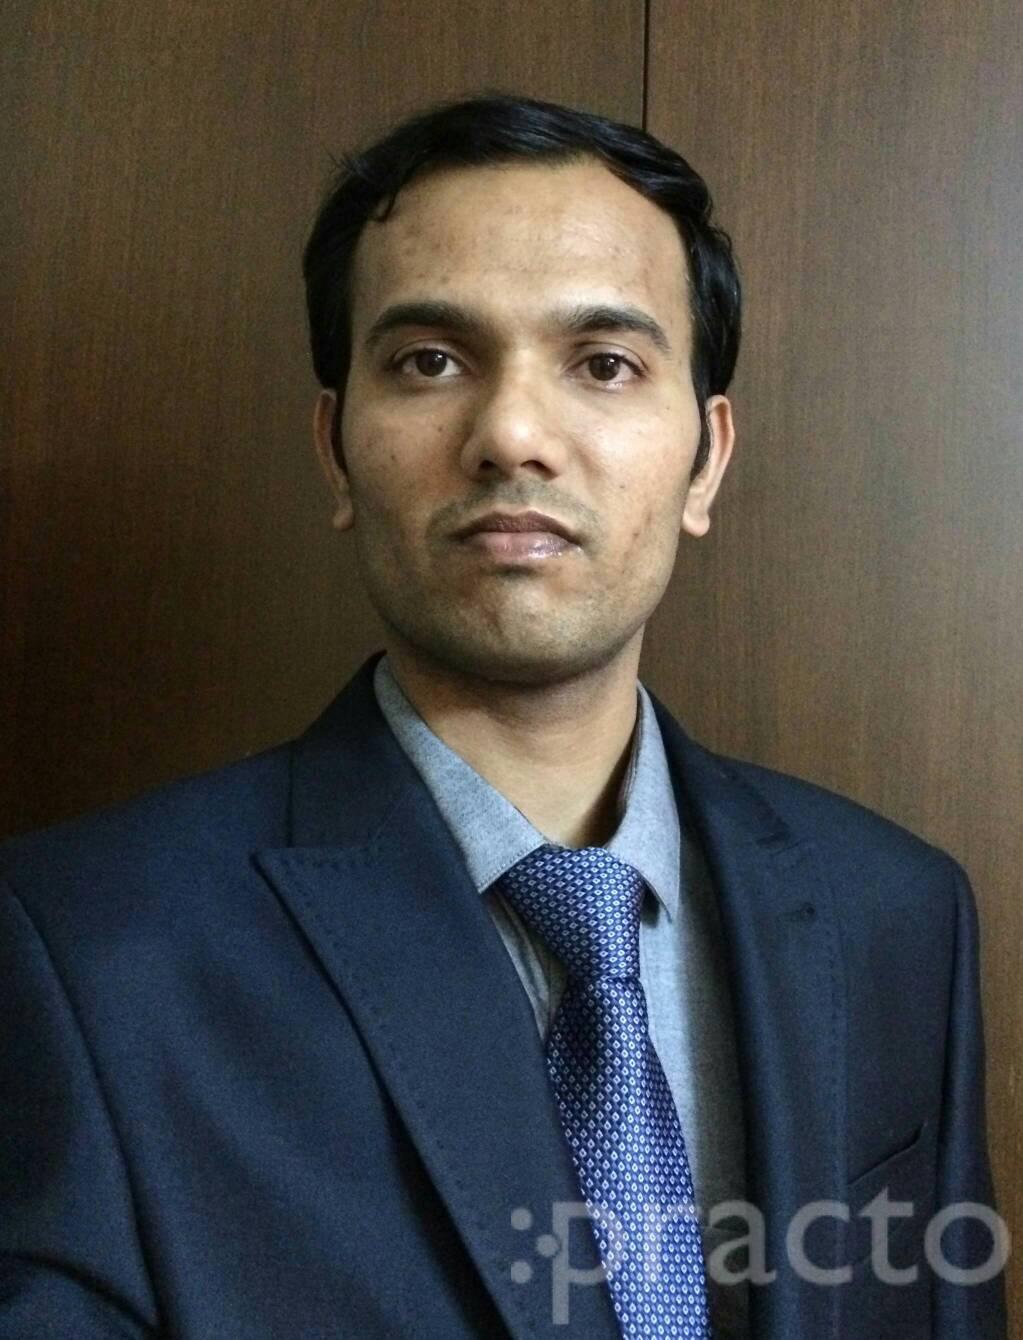 Dr. Sandeep Dachuri - Ear-Nose-Throat (ENT) Specialist